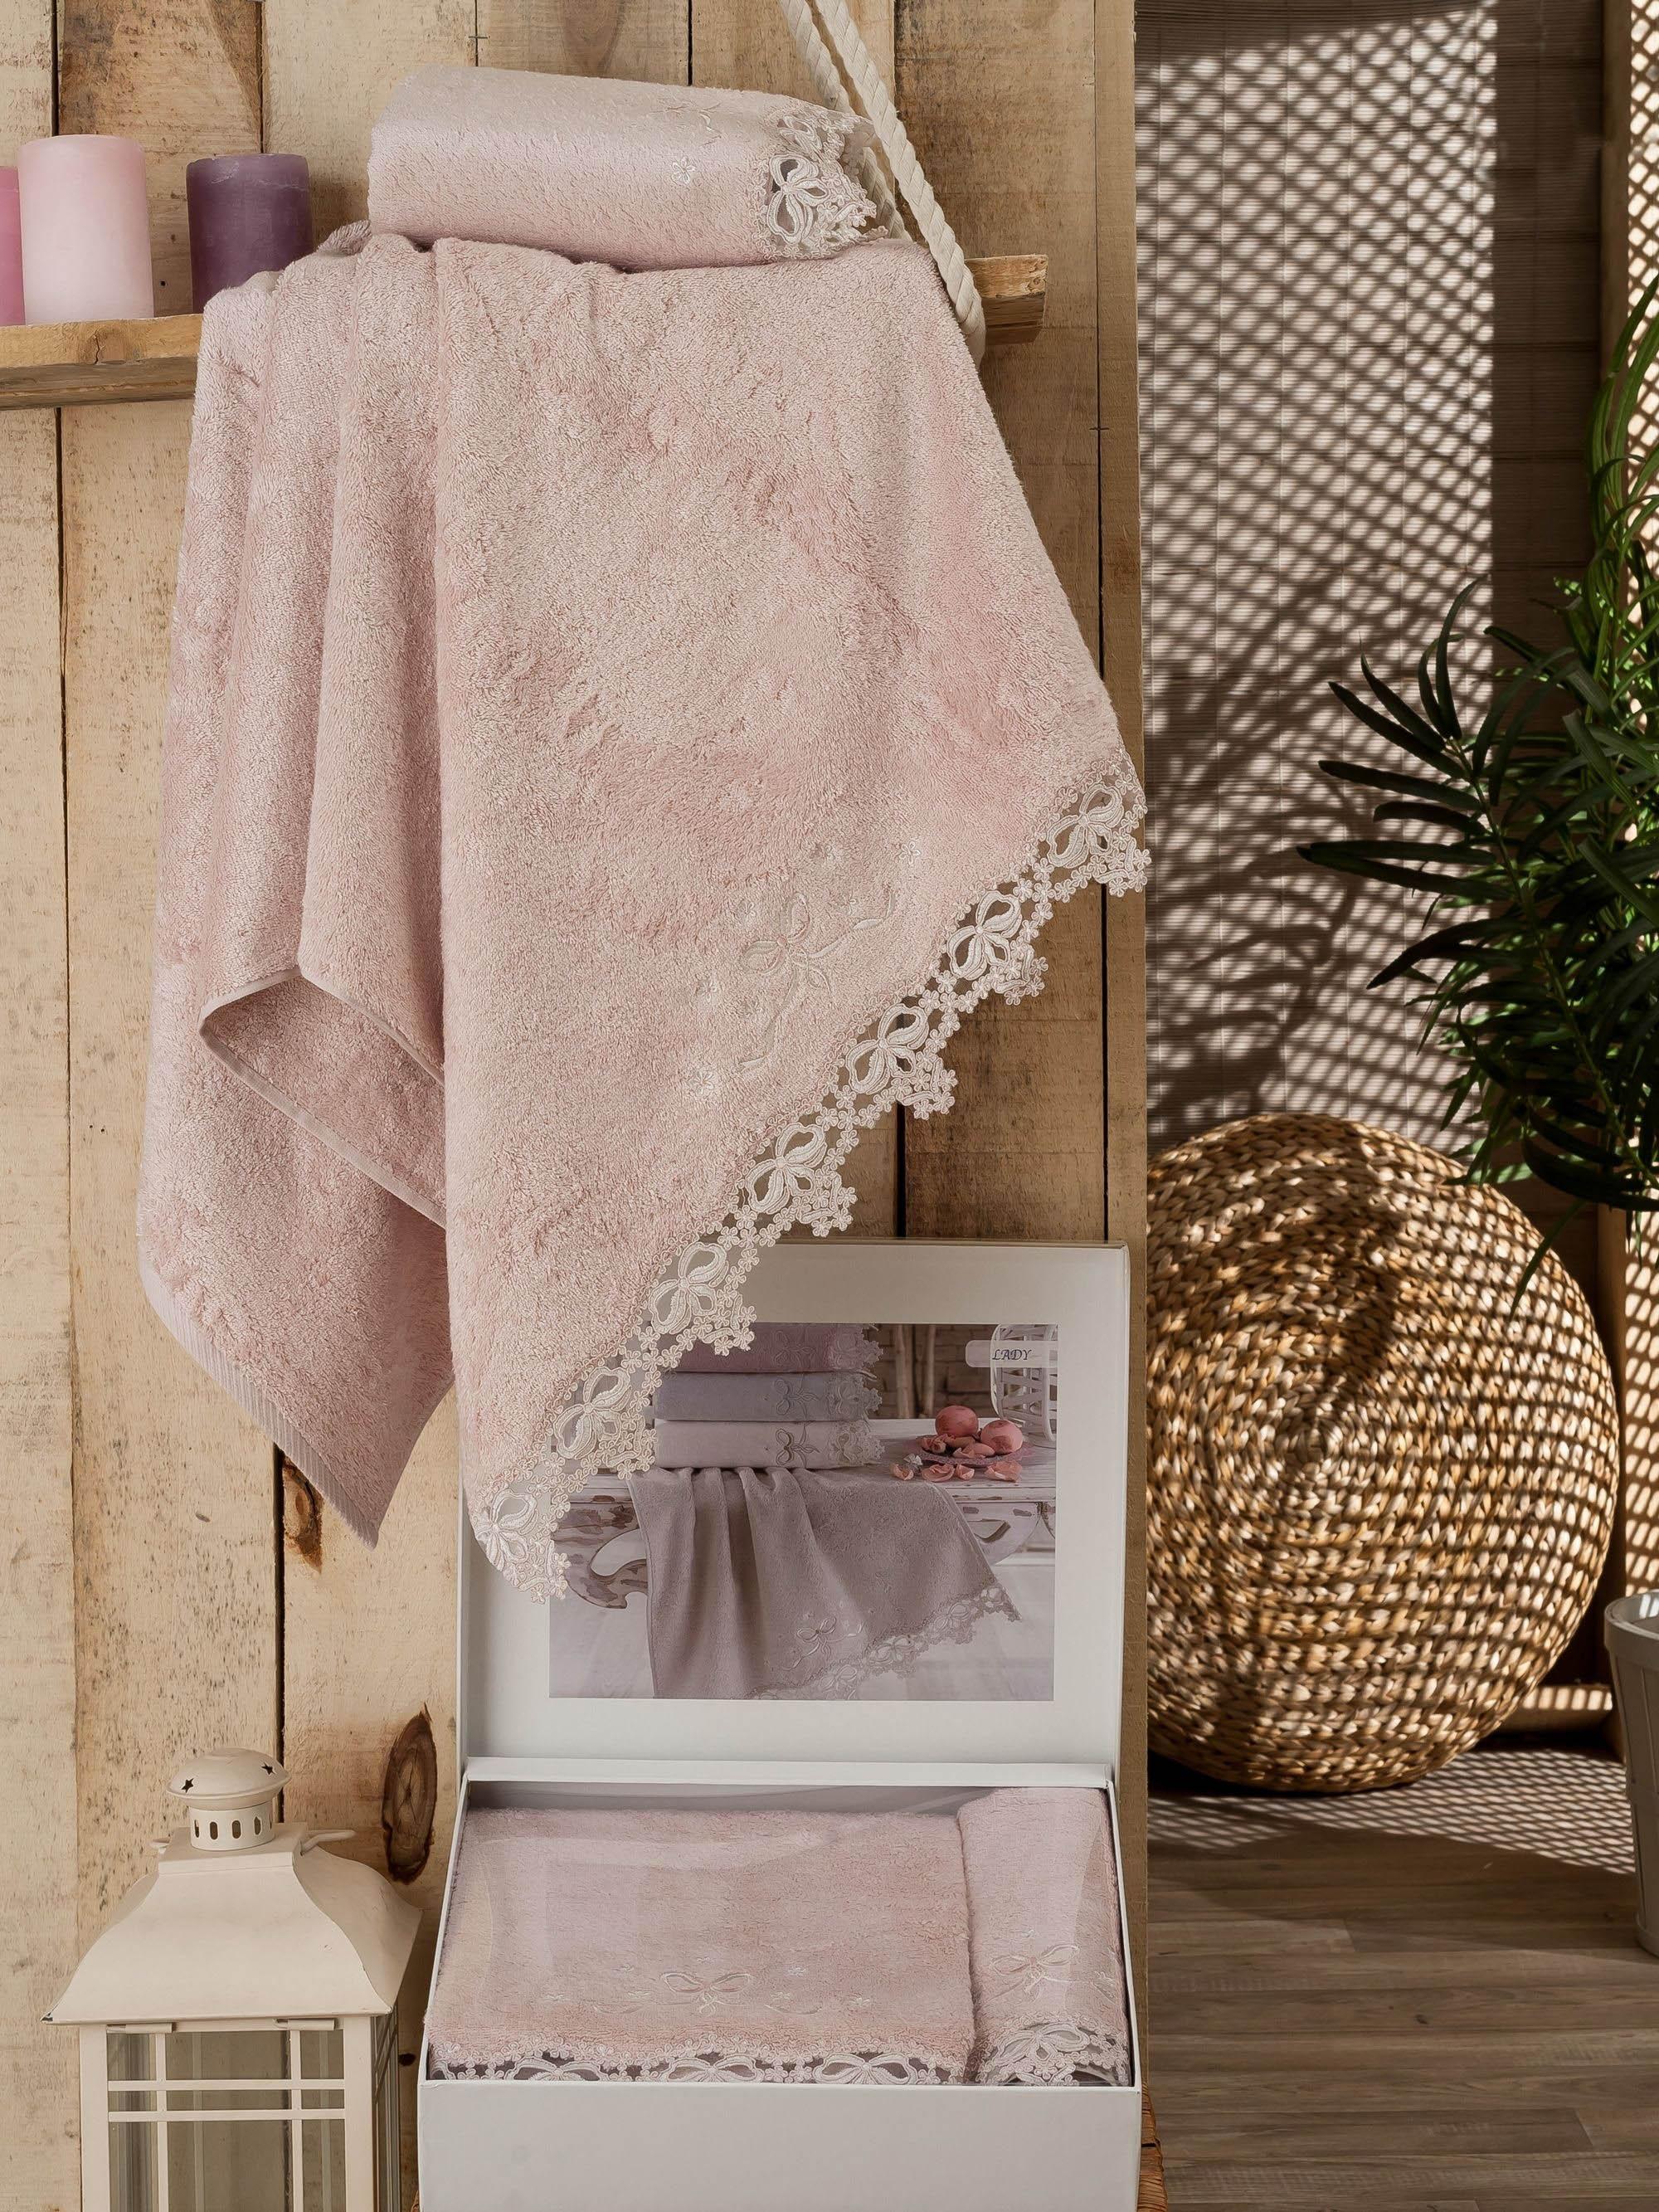 Полотенца DO'n'CO Полотенце Lady Цвет: Пудра (Набор) набор из 3 полотенец merzuka sakura 50х90 2 70х140 8432 оранжевый